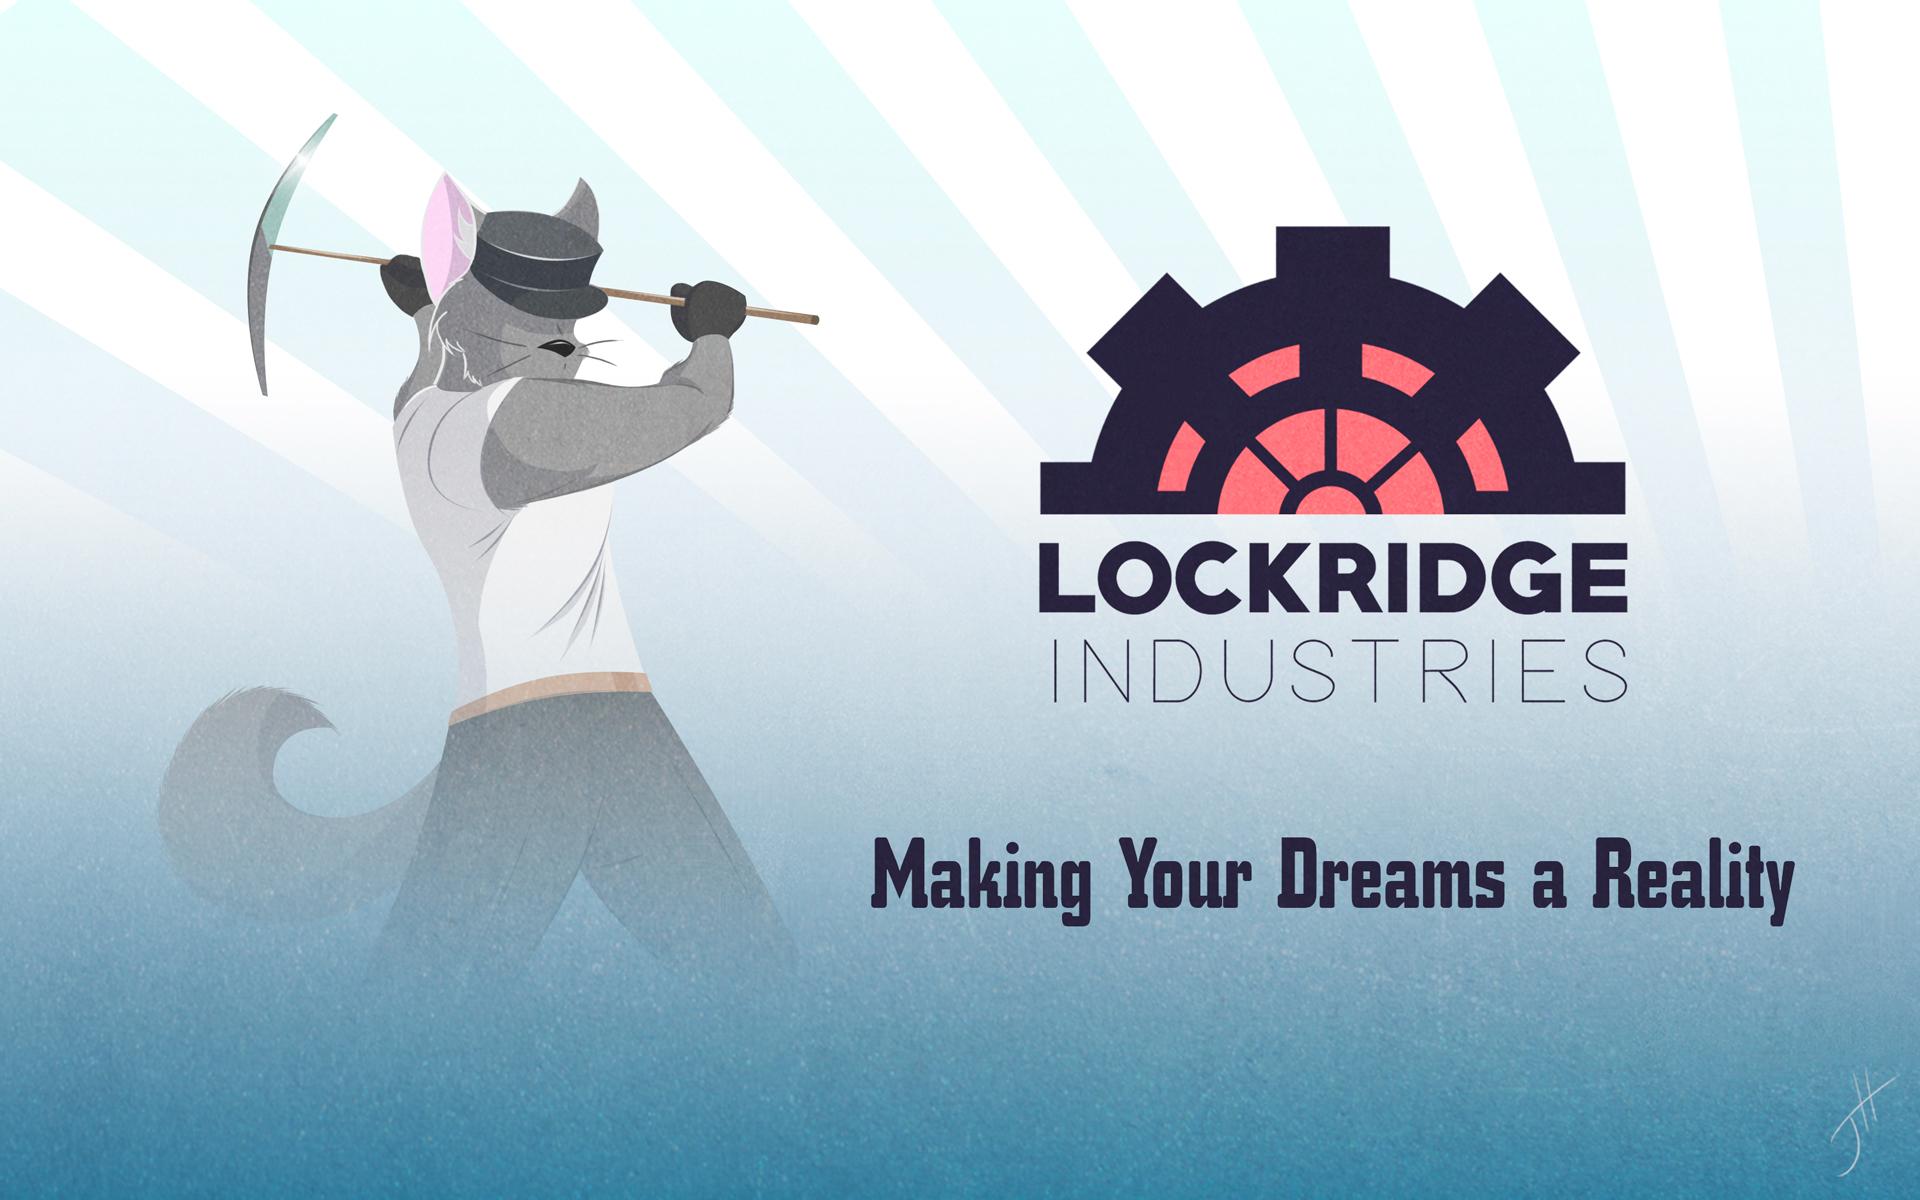 Lockridge Industries Poster Ad